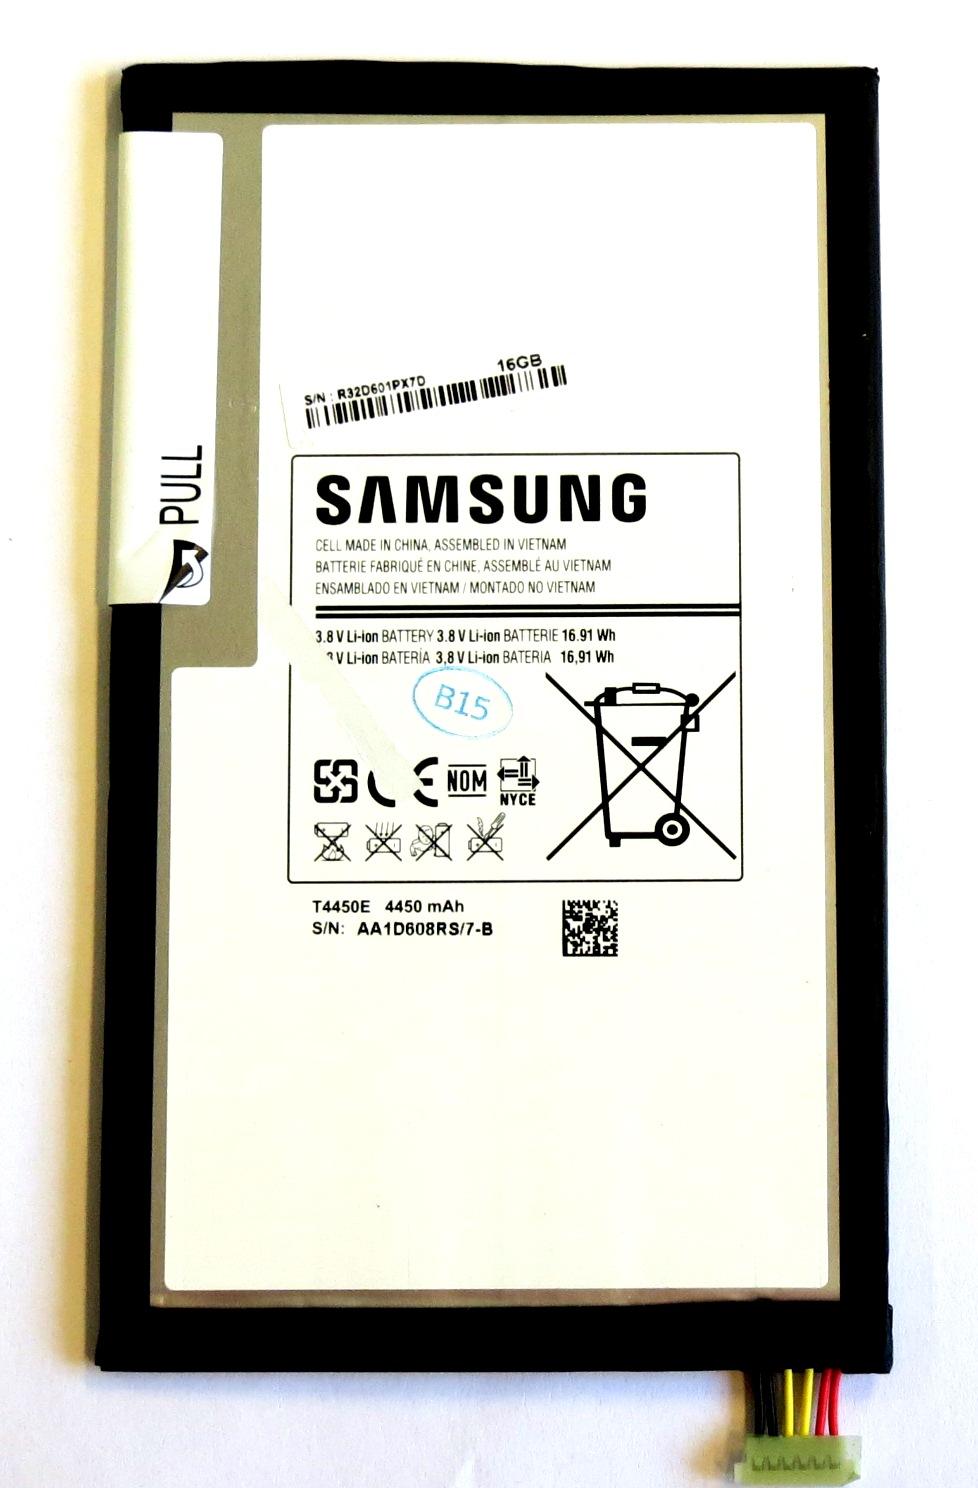 Baterie Samsung T4450E, 4450mAh Li-Ion (Bulk)